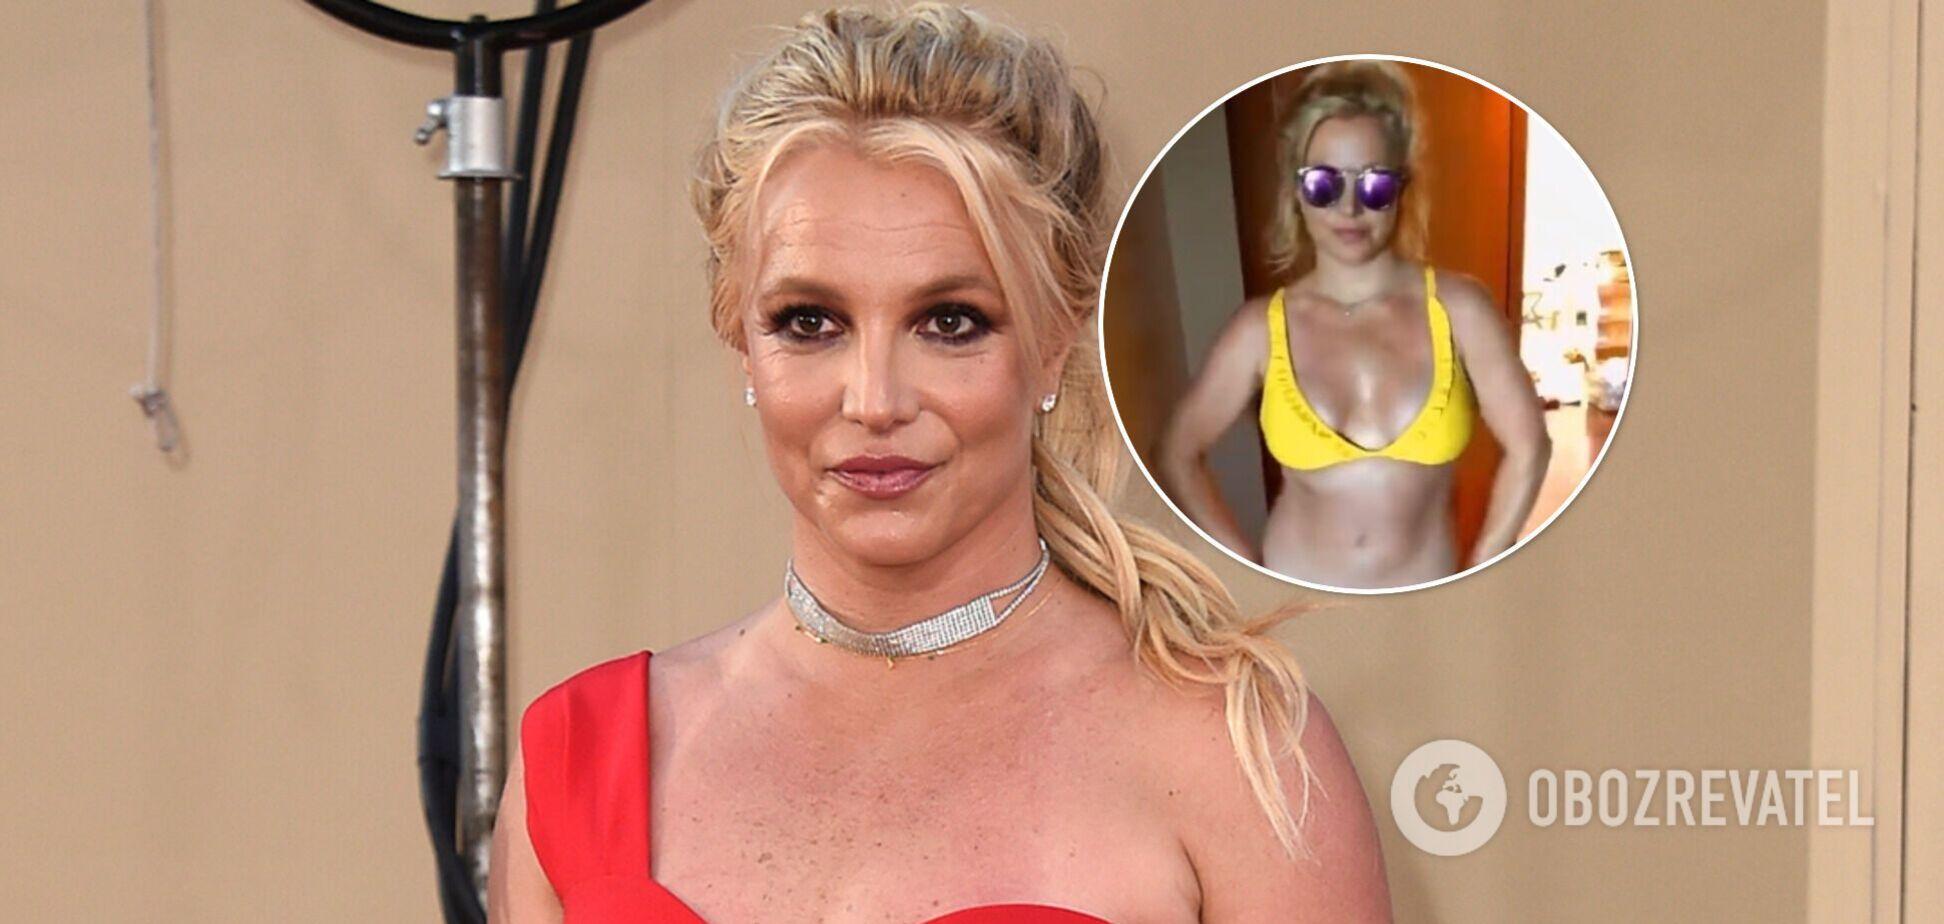 39-летняя Бритни Спирс покрасовалась фигурой в ярких купальниках. Видео